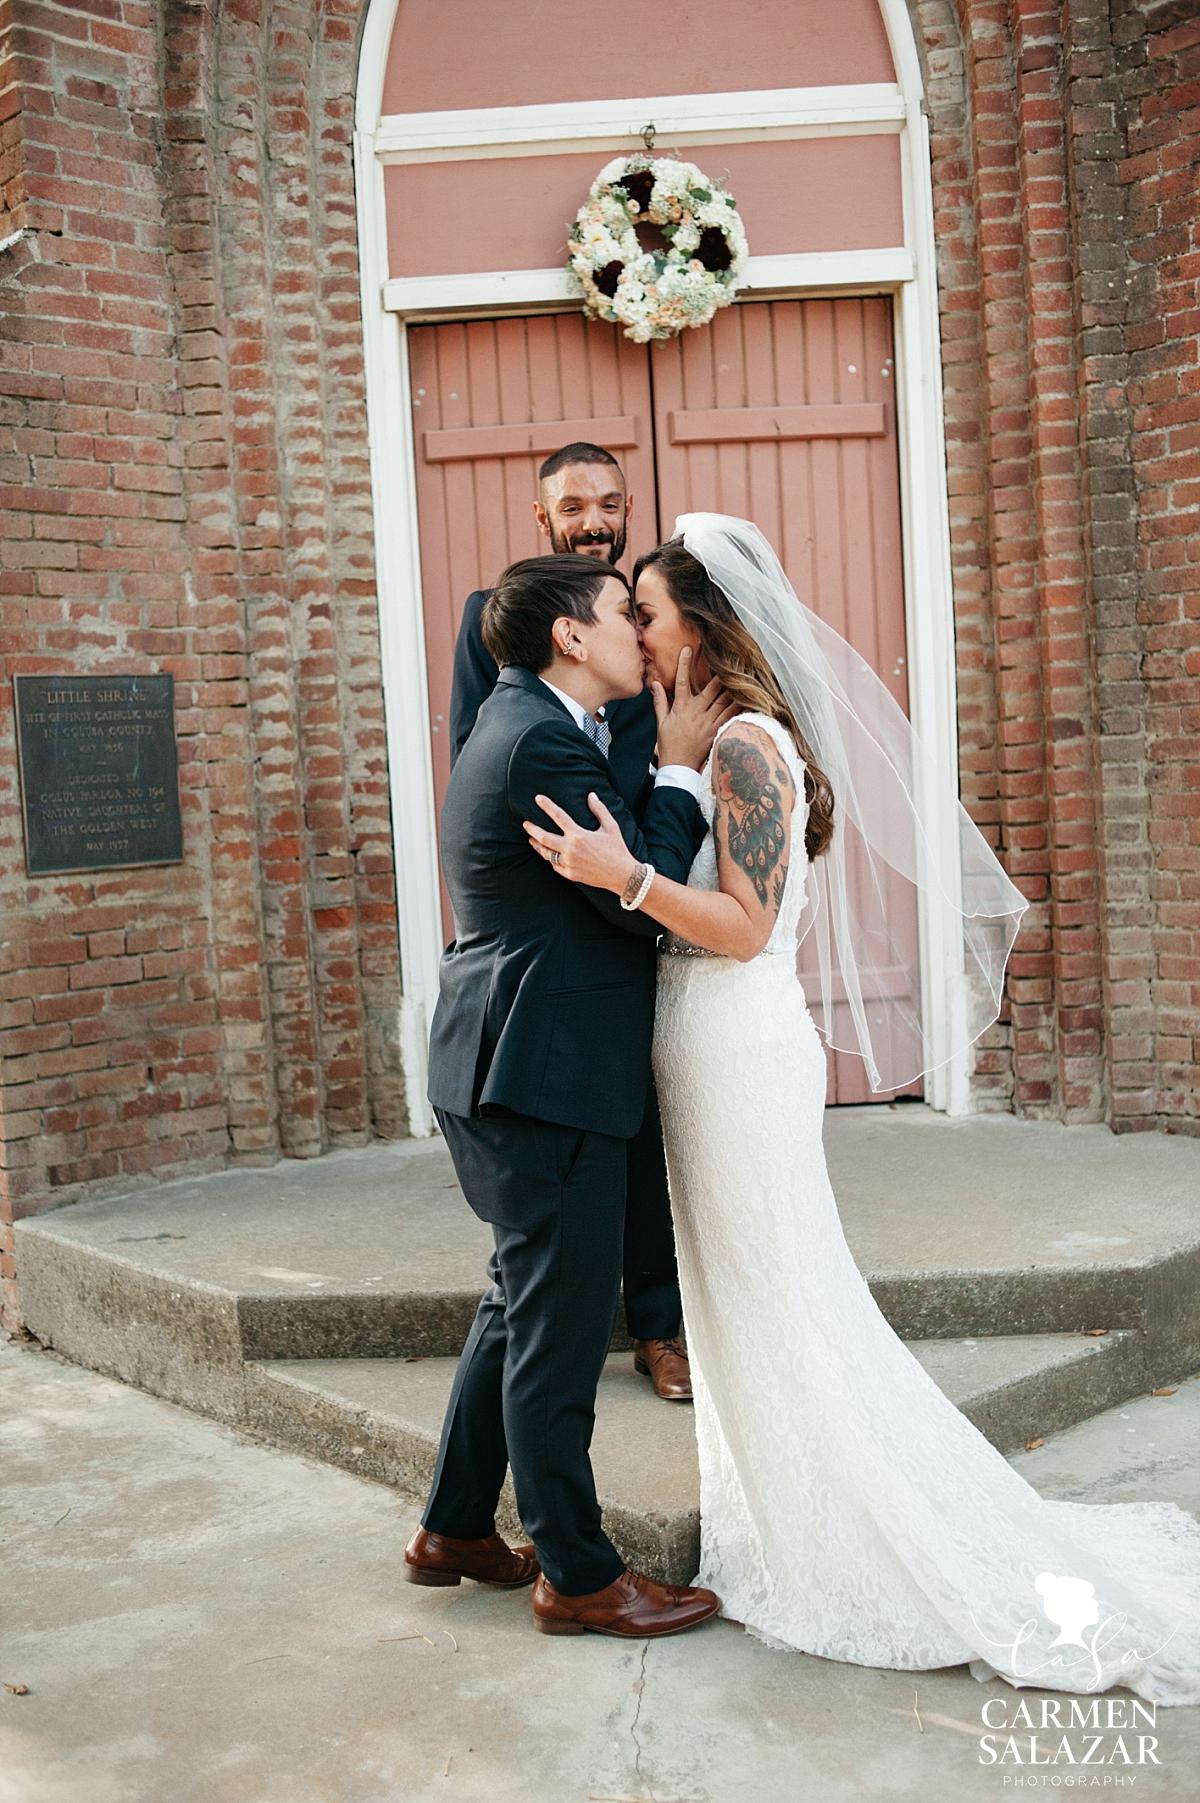 First kiss at Little Shrine of Grimes lesbian wedding - Carmen Salazar